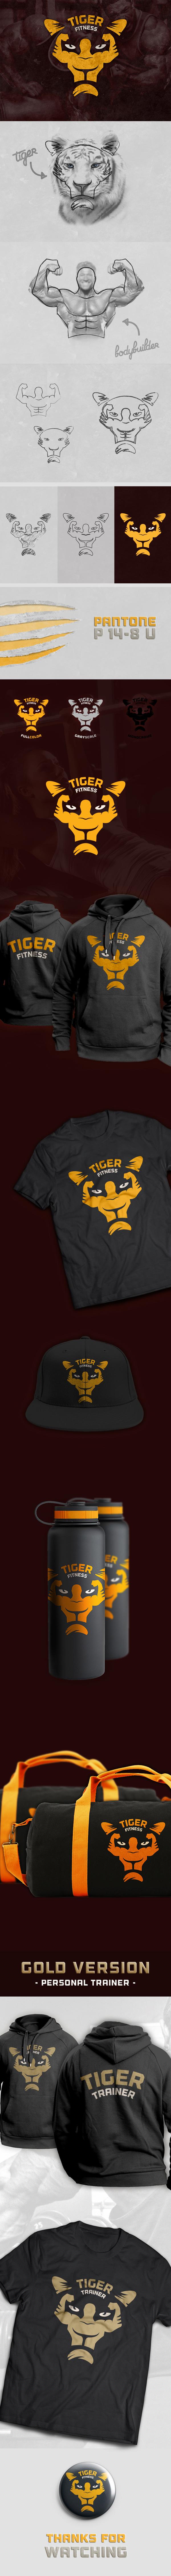 fitness gym bodybuilder trainer logo brand Logotype identity corporate apparel Logo Design visual identity BodyBuilding tiger sport